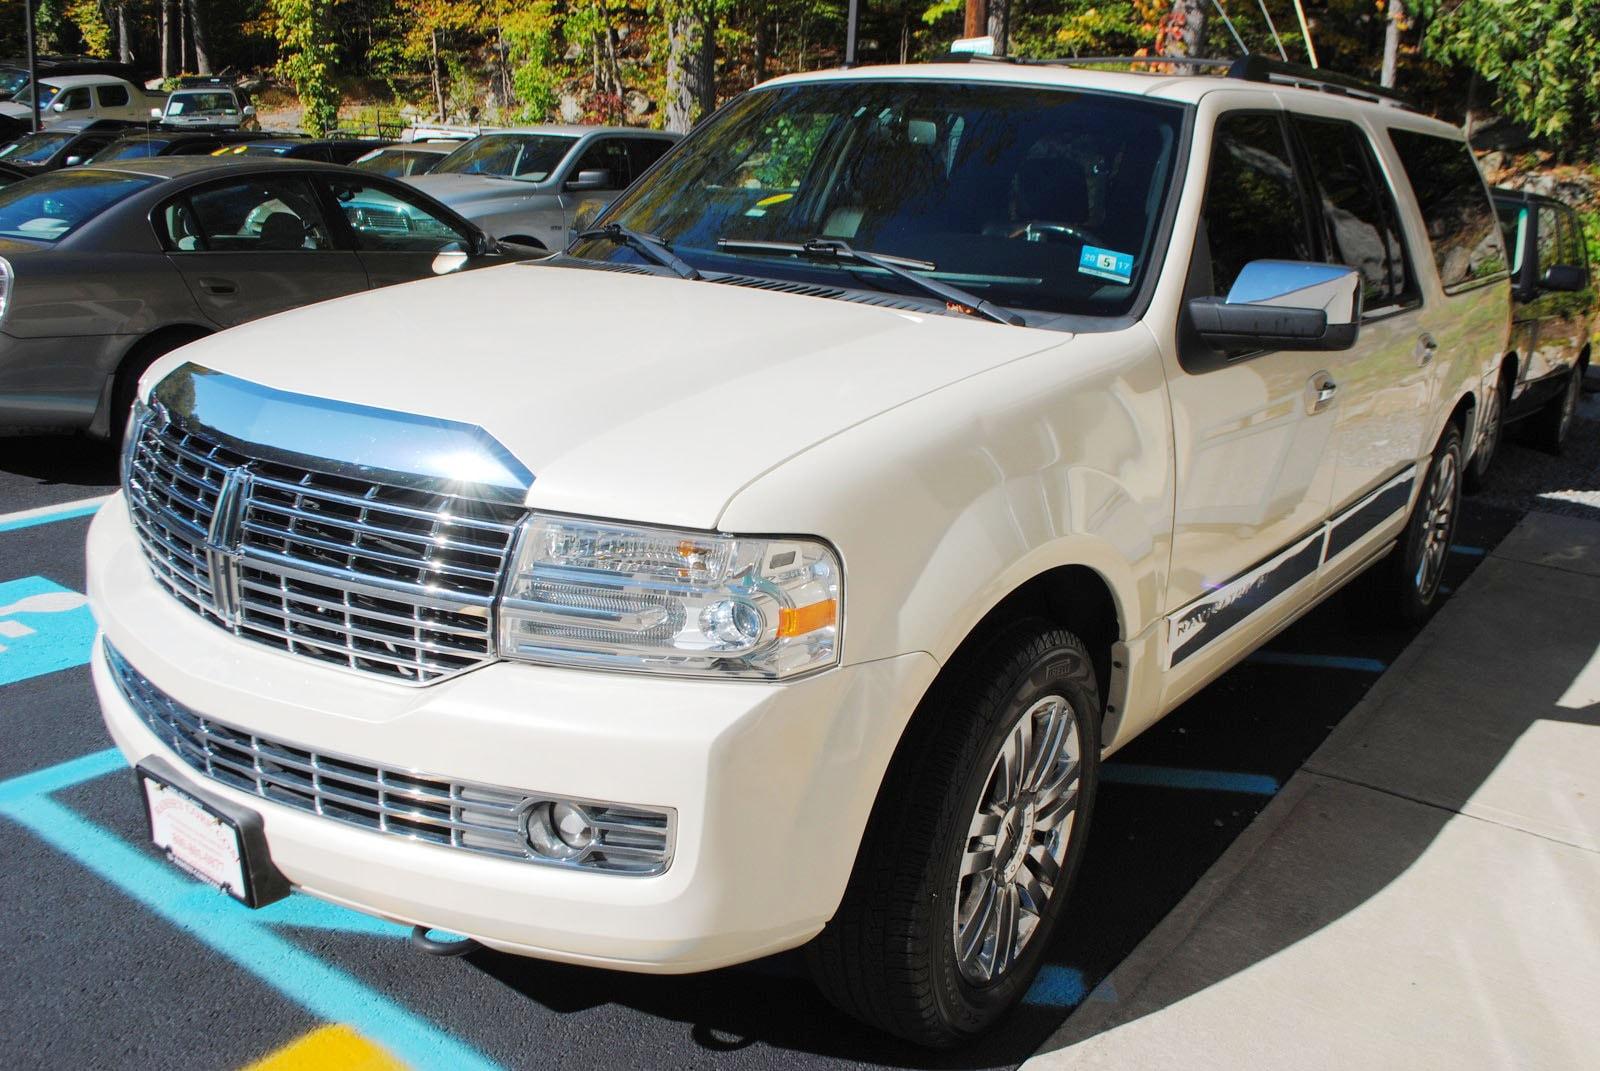 Used 2008 Lincoln Navigator L For Sale West Milford Nj